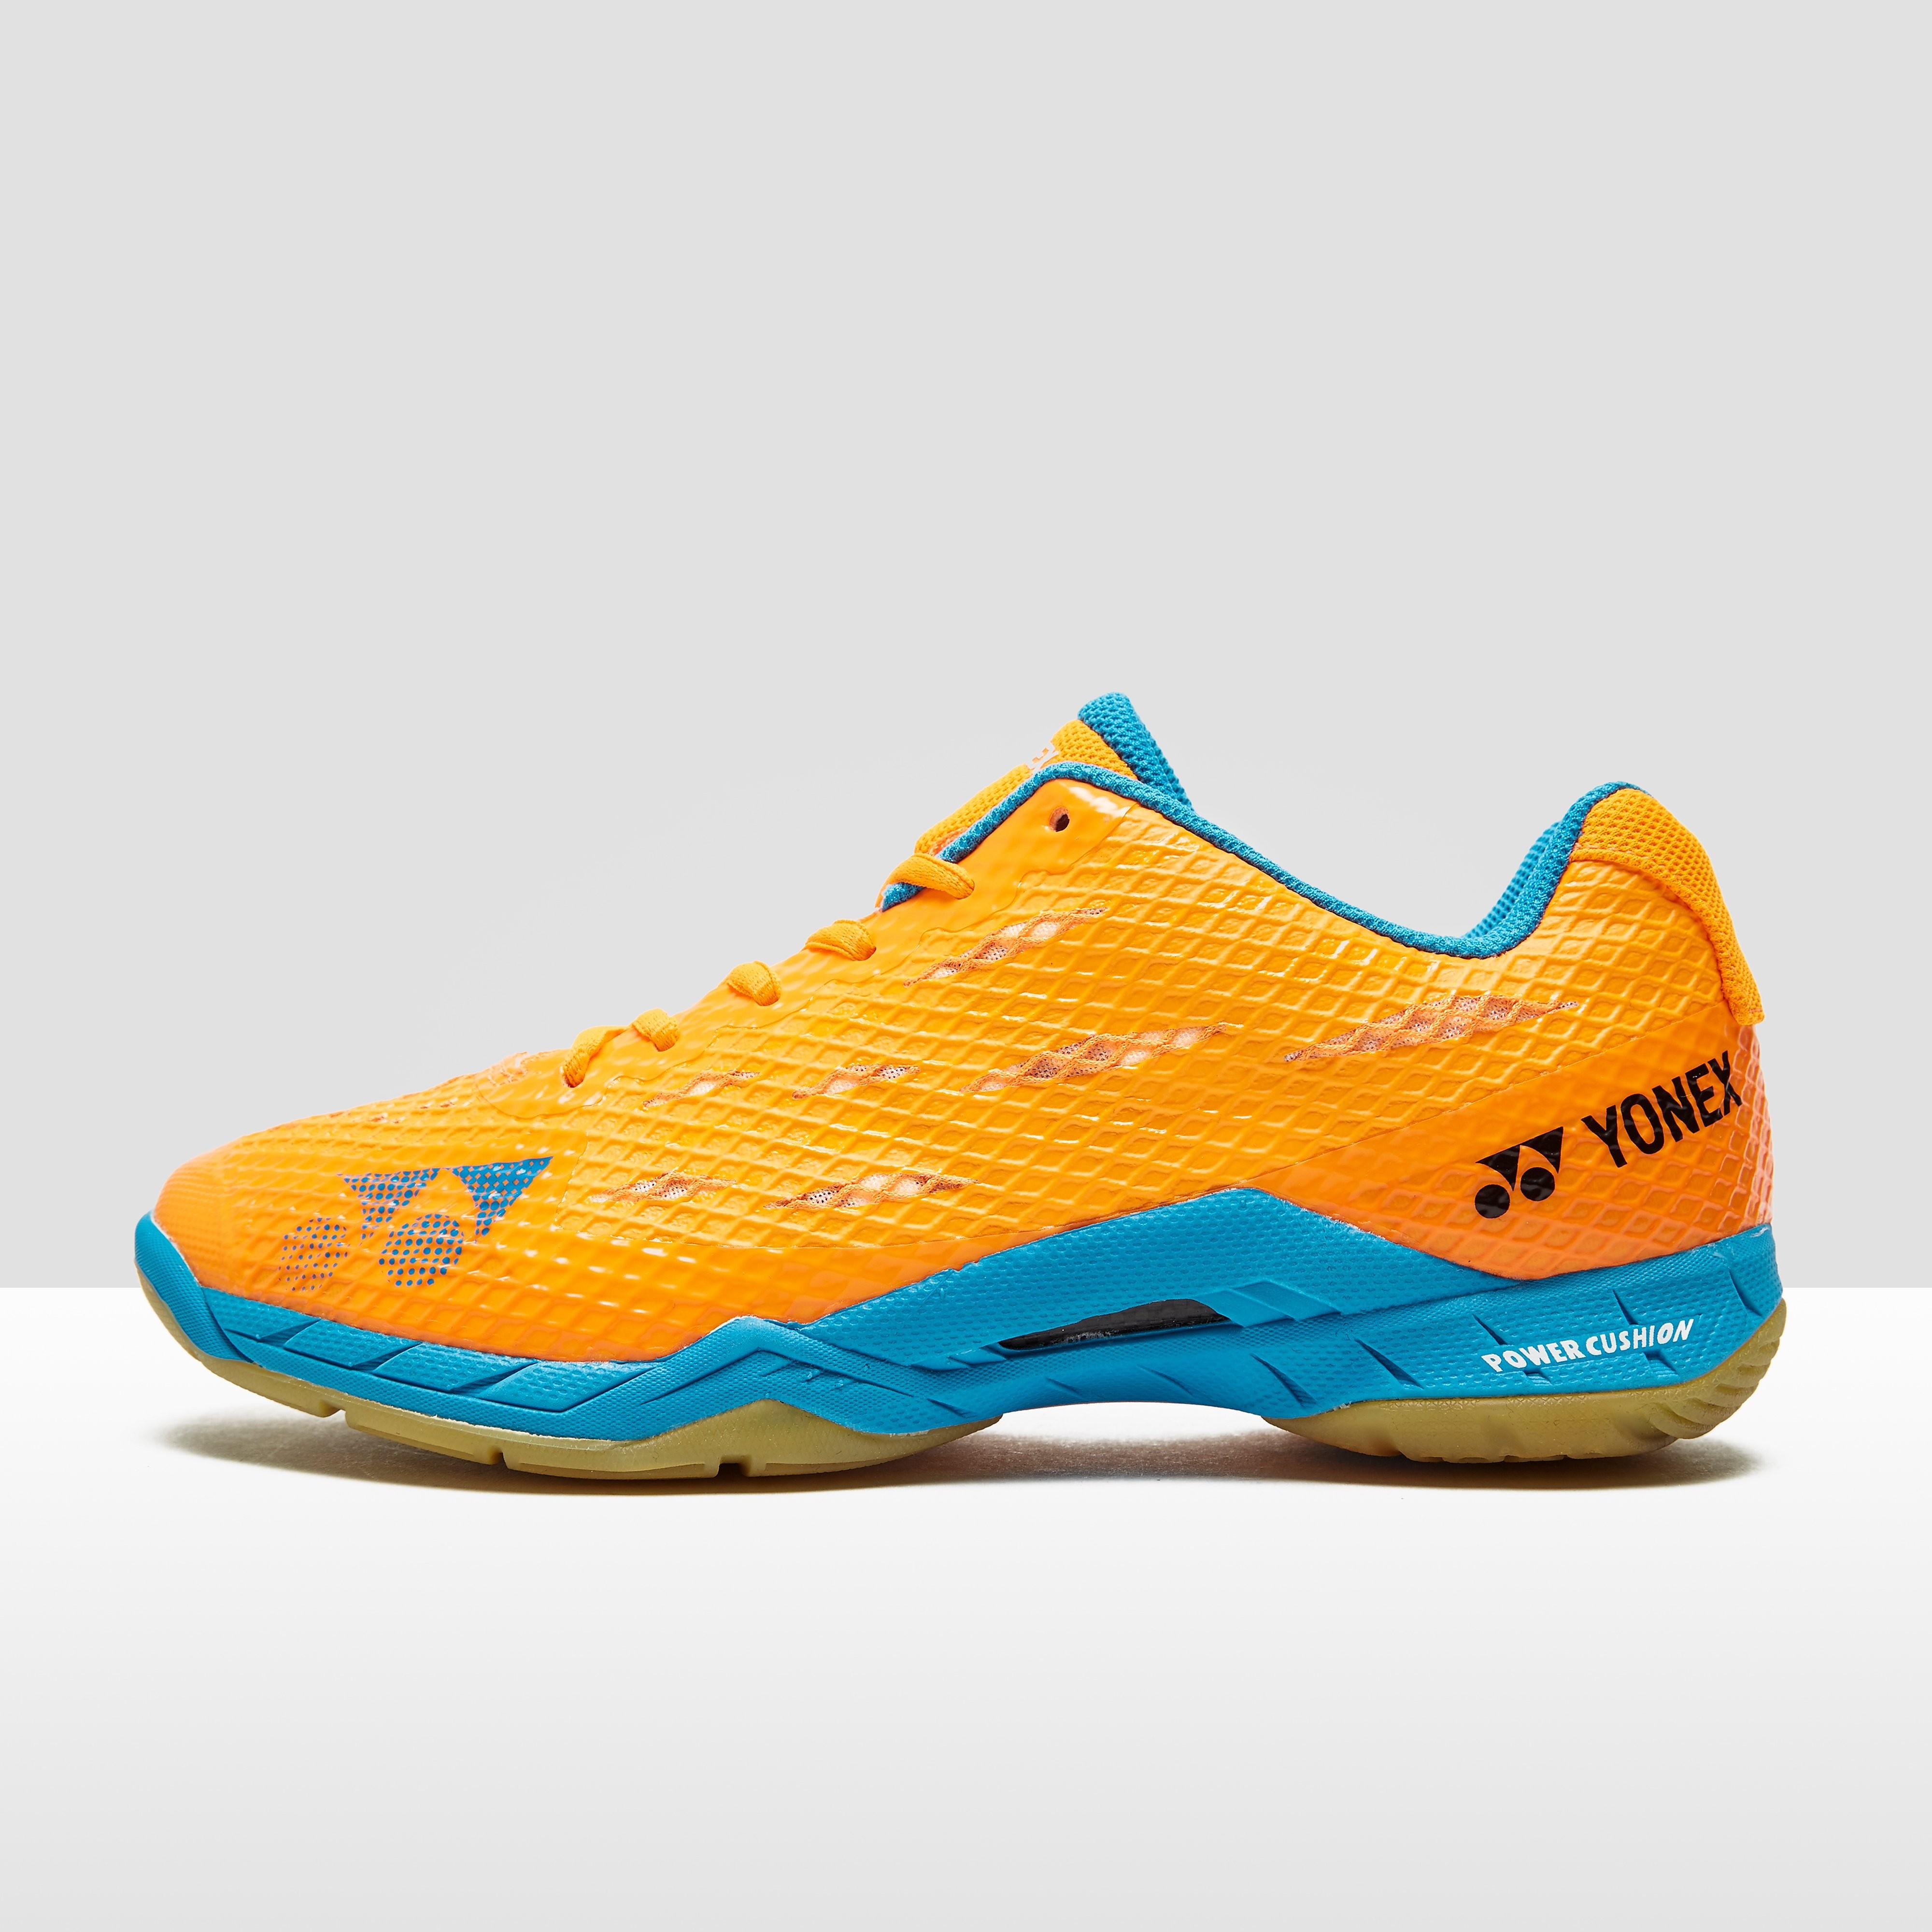 Yonex Power Cushion Aerus Men's Badminton Shoes